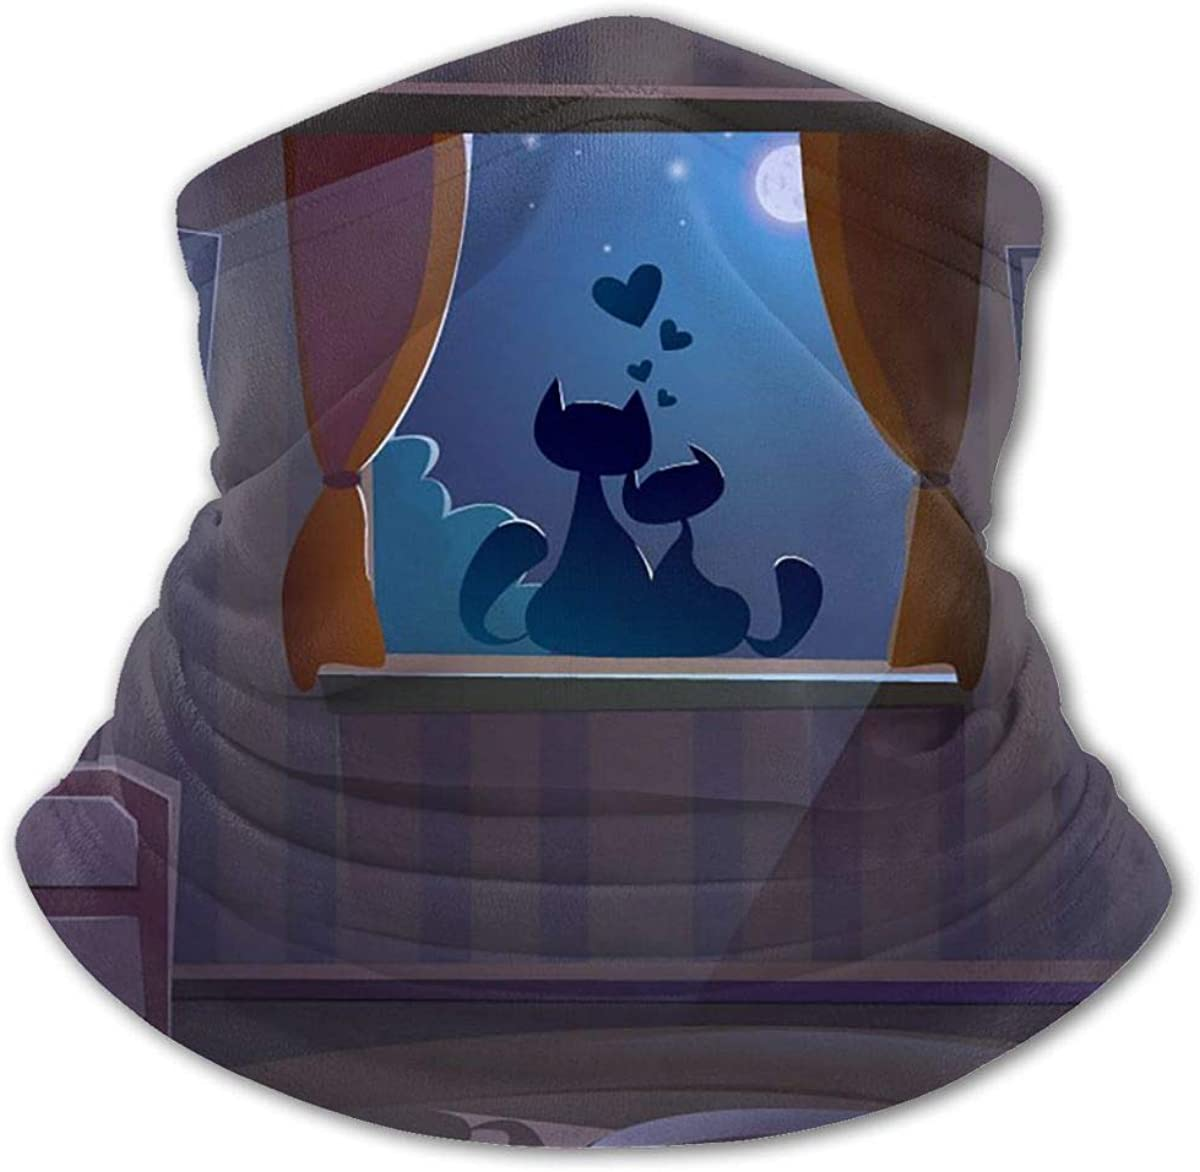 Cats Windowsill Headwear For Girls And Boys, Head Wrap, Neck Gaiter, Headband, Tenn Fishing Mask, Magic Scarf, Tube Mask, Face Bandana Mask For Camping Running Cycling